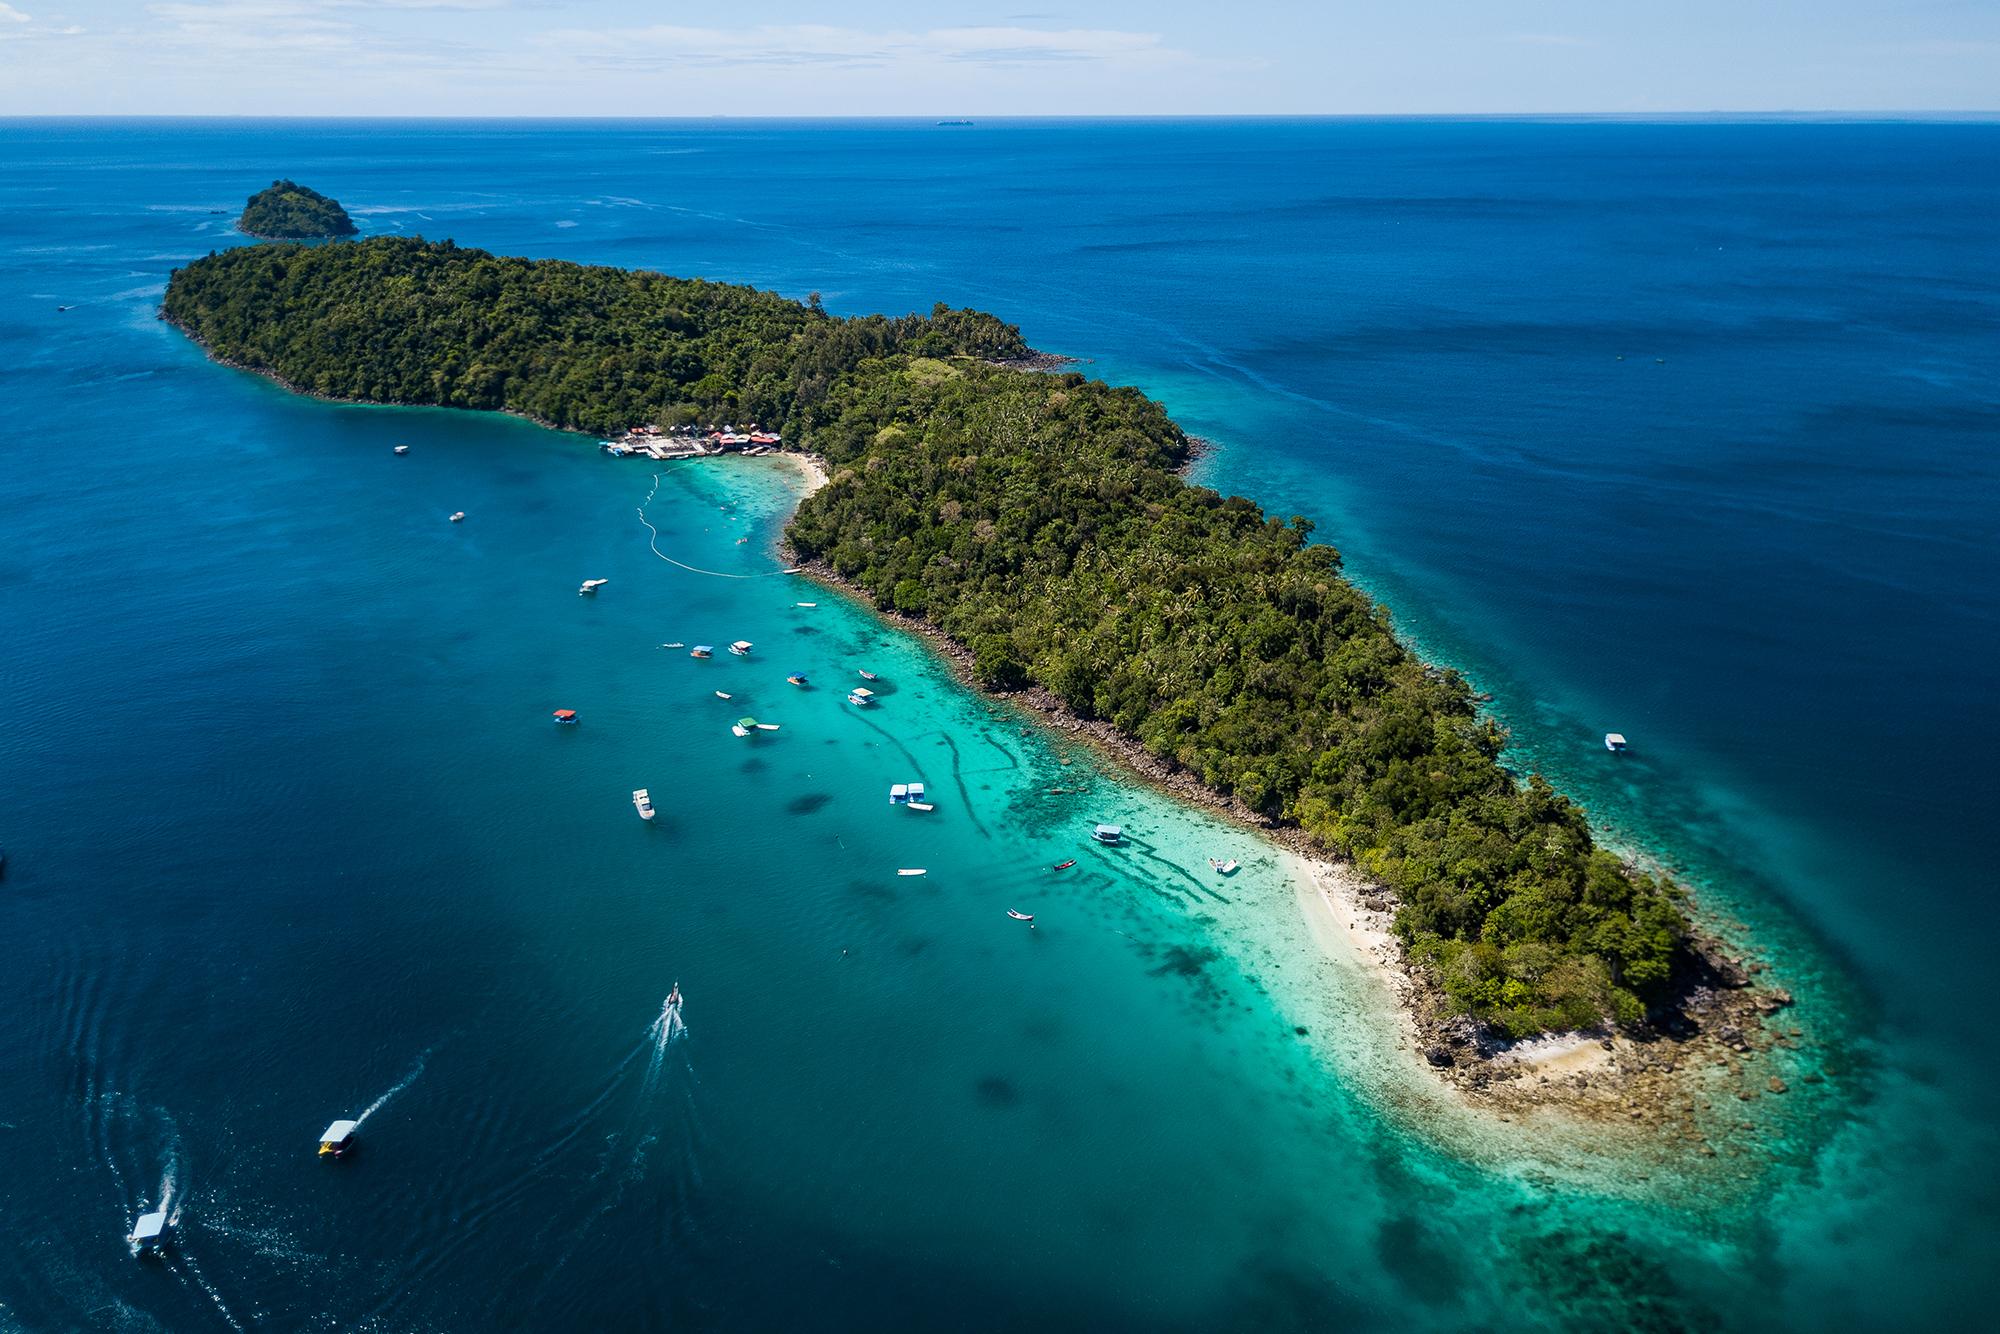 palau weh, indonesia credit: yen-yi lee / coral reef image bank